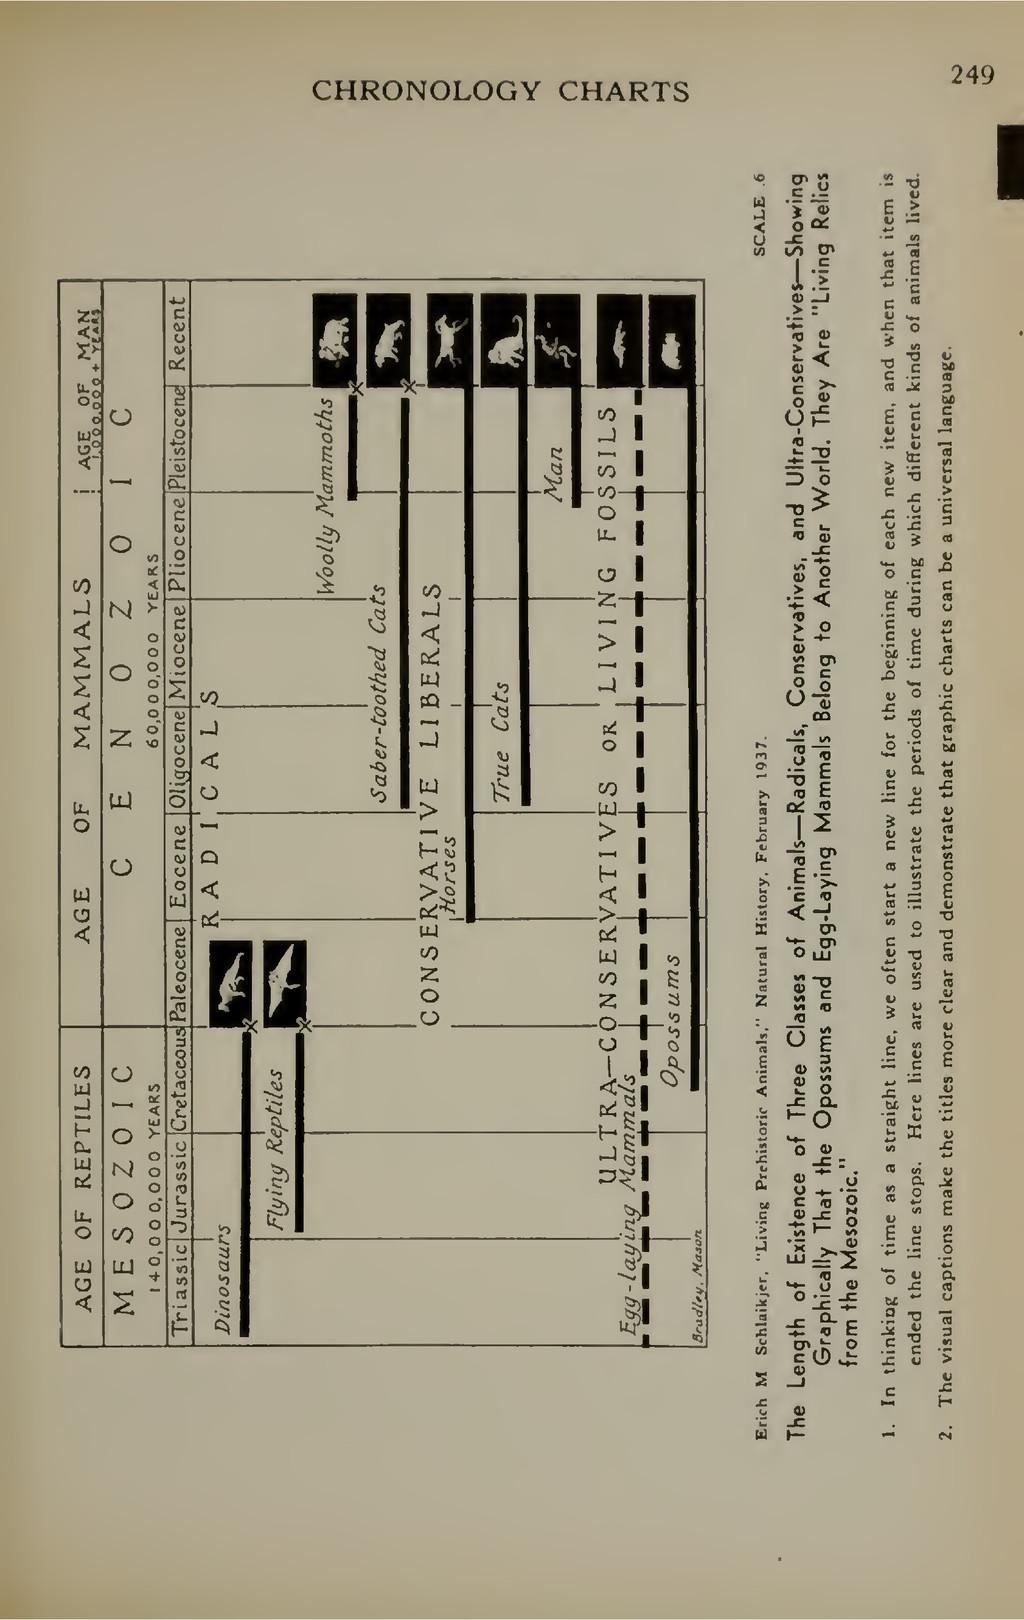 CHRONOLOGY CHARTS 249